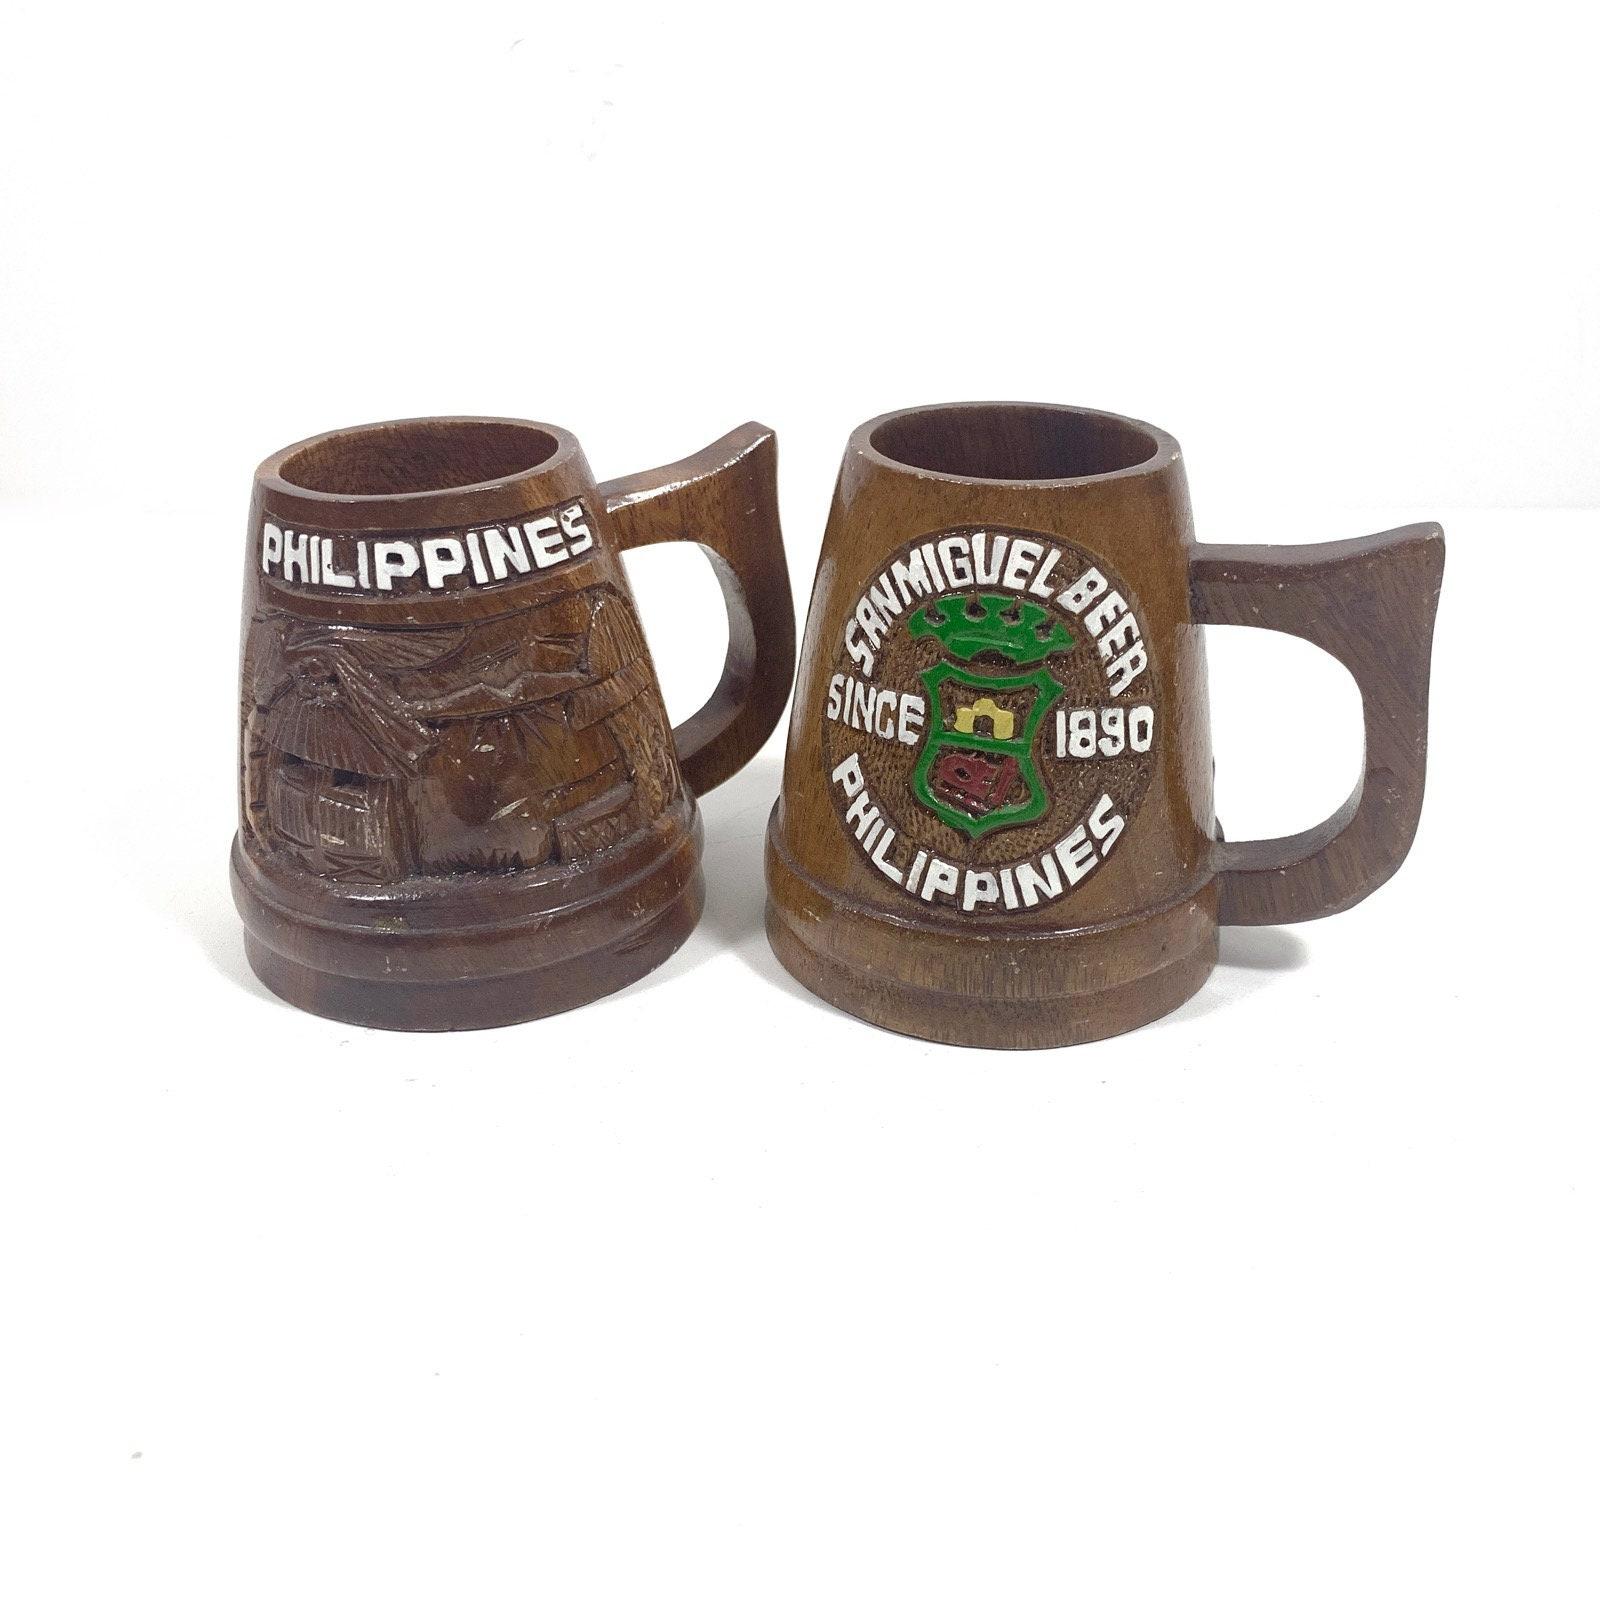 Tiki Mugs with Carved Wood Design, Vintage Wooden Tiki Beer Stein, Tiki Bar  Decor, Philippines Souvenir Mugs for San Miguel Beer